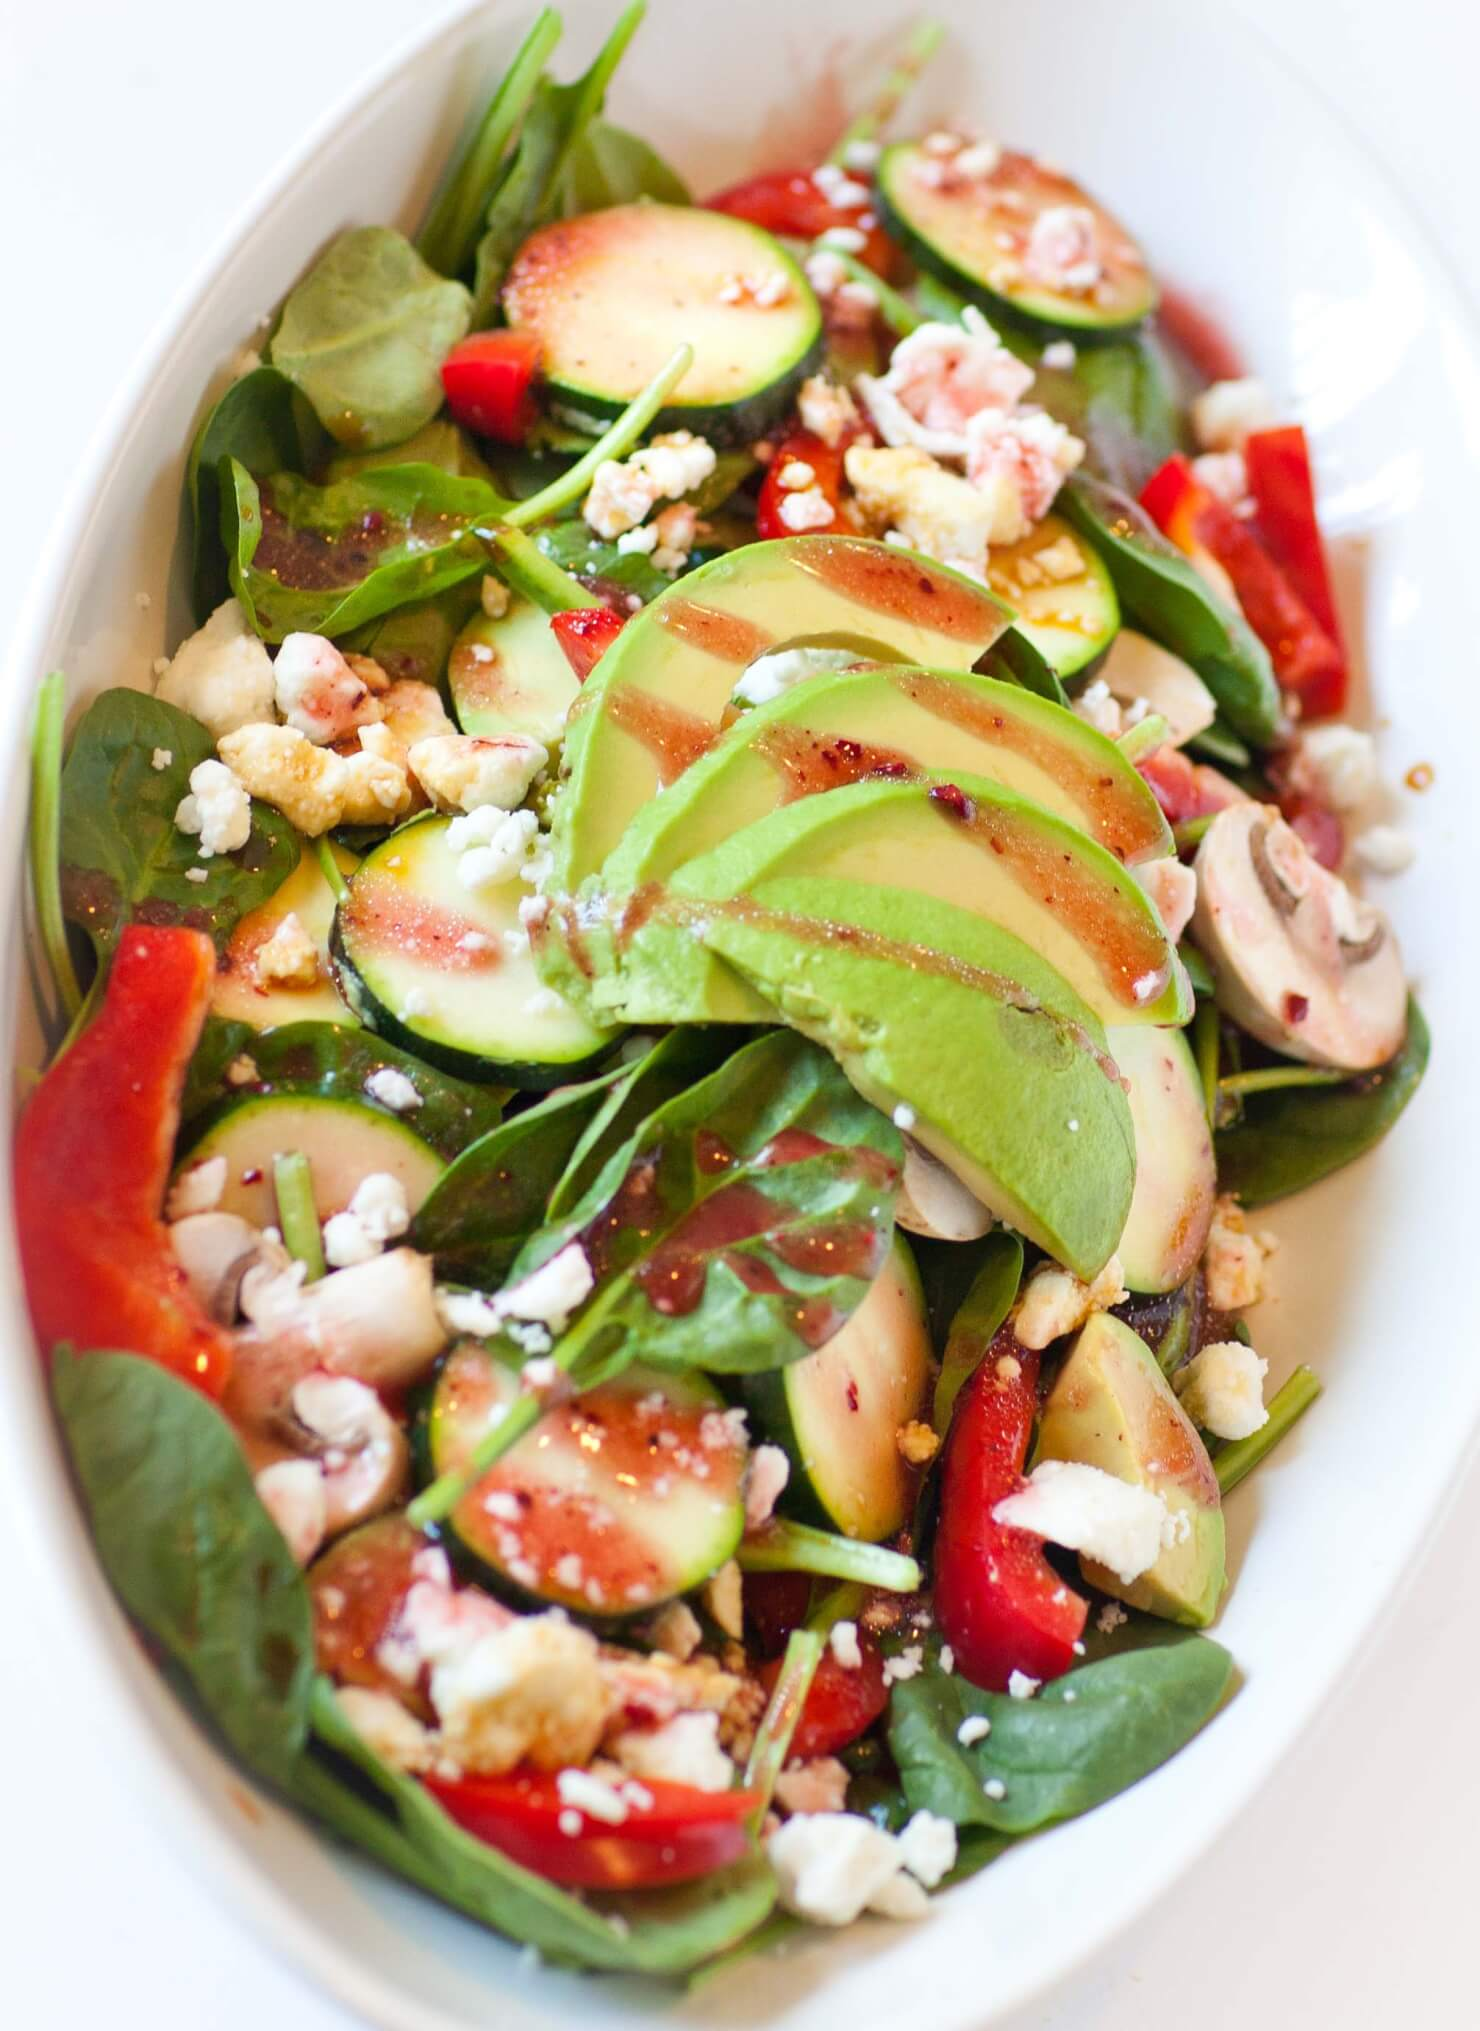 Feta Spinach Salad with Raspberry Vinaigrette - Tatyanas ...